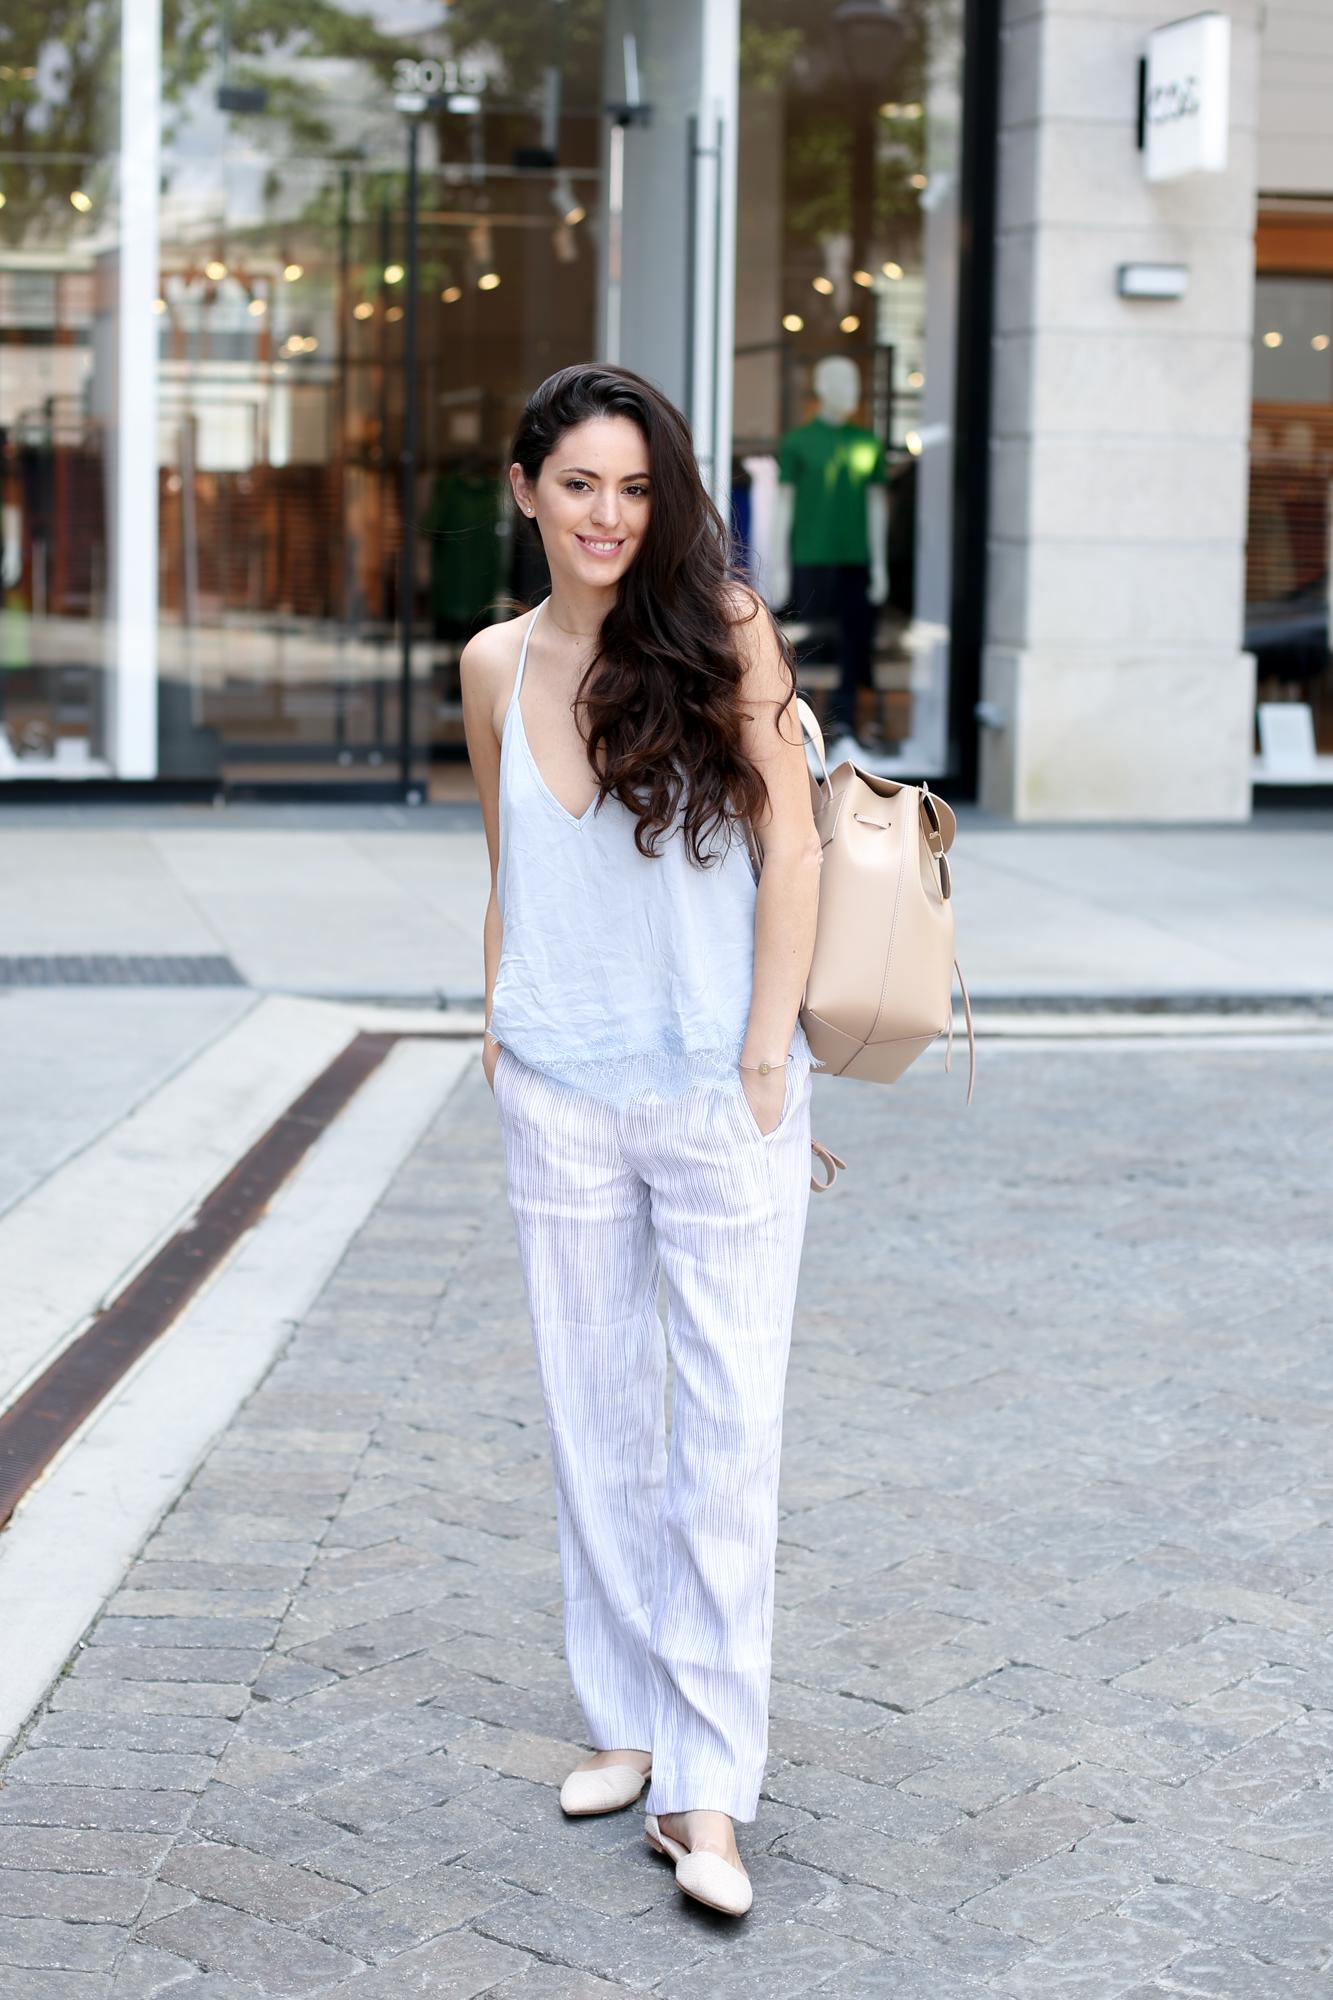 tiger women and pj gentle cotton best pajamas splendid set comforter jacquard the strategist comfortable silk article for